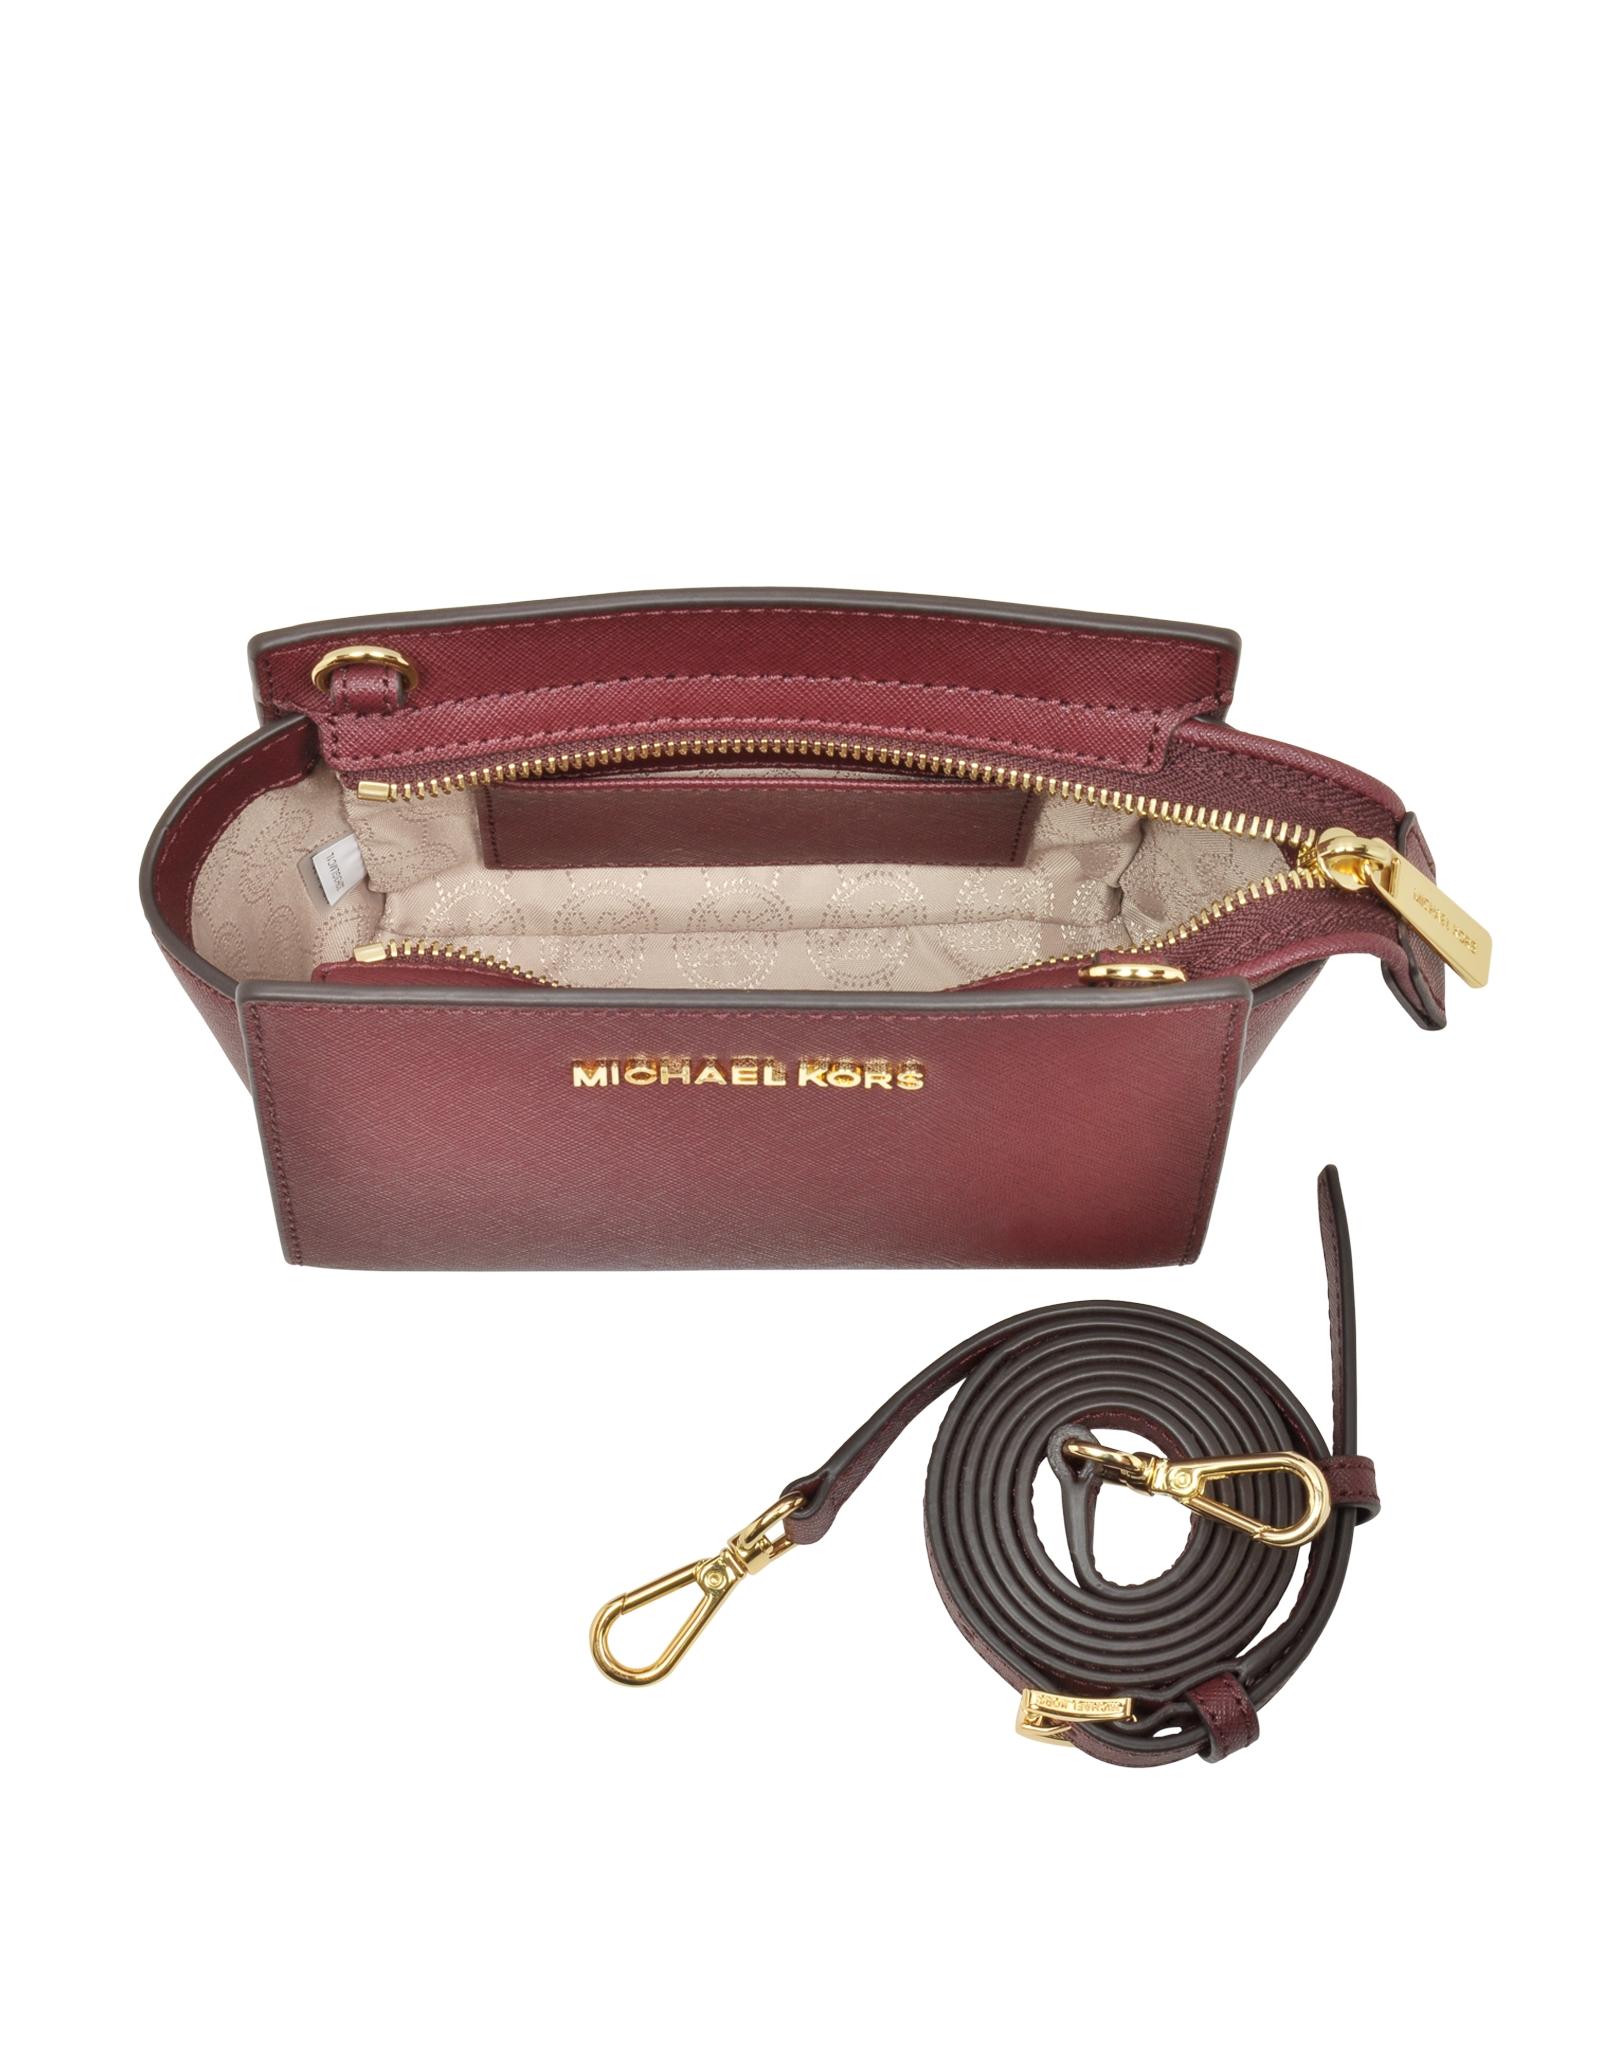 510a28ea07f2 Gallery. Women's Leather Messenger Bags Women's Michael By Michael Kors  Selma